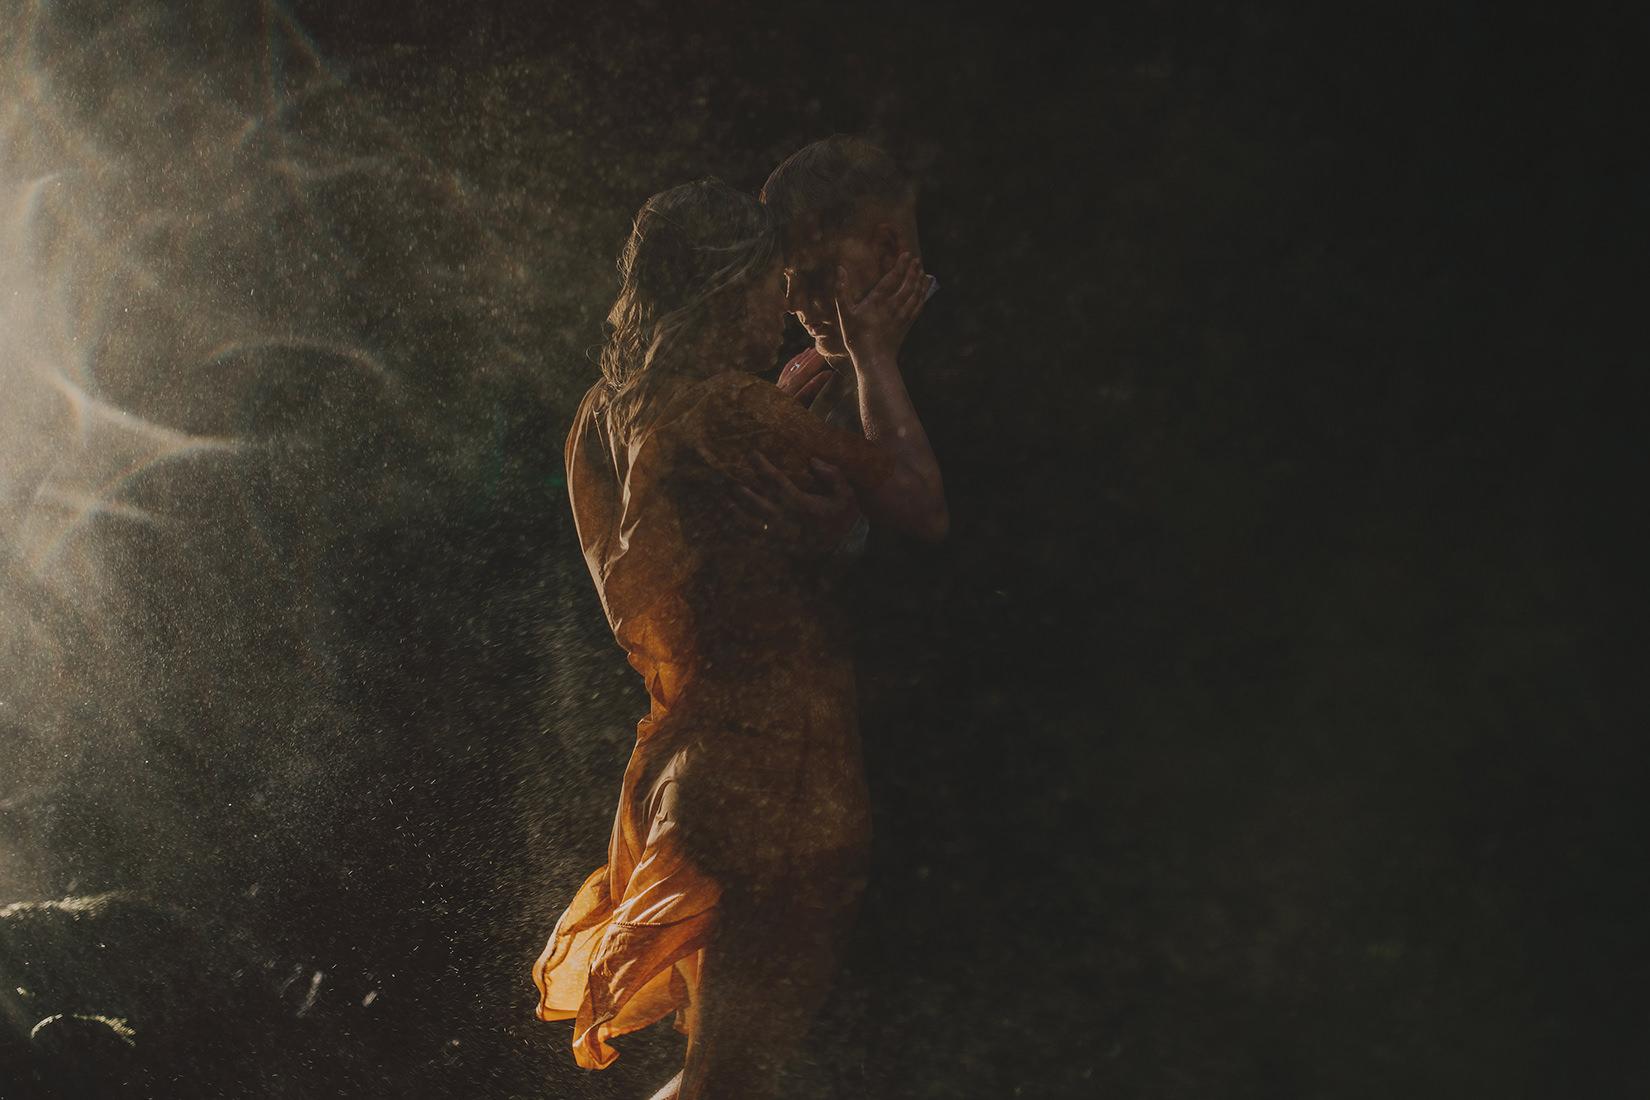 Calgary wedding photographers, Calgary wedding, wedding photography, Banff wedding photographers, Canmore wedding, destination wedding photographer, St Lucia wedding, Iceland wedding, California wedding, New York wedding, wedding photographer, worlds best wedding, canon camera, ©Gabe McClintock Photography